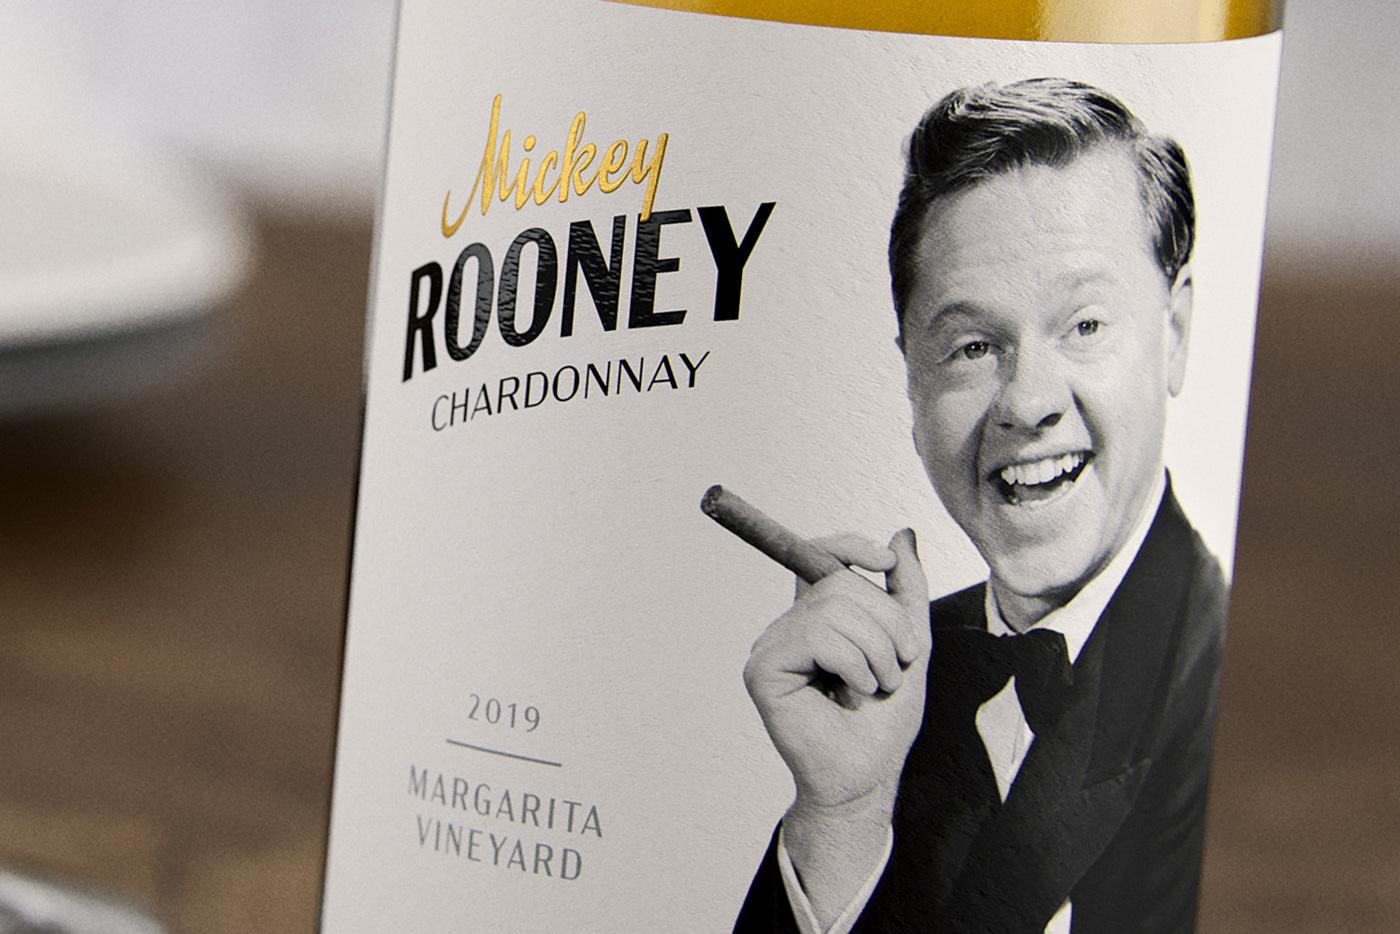 Mickey Rooney — Chardonnay